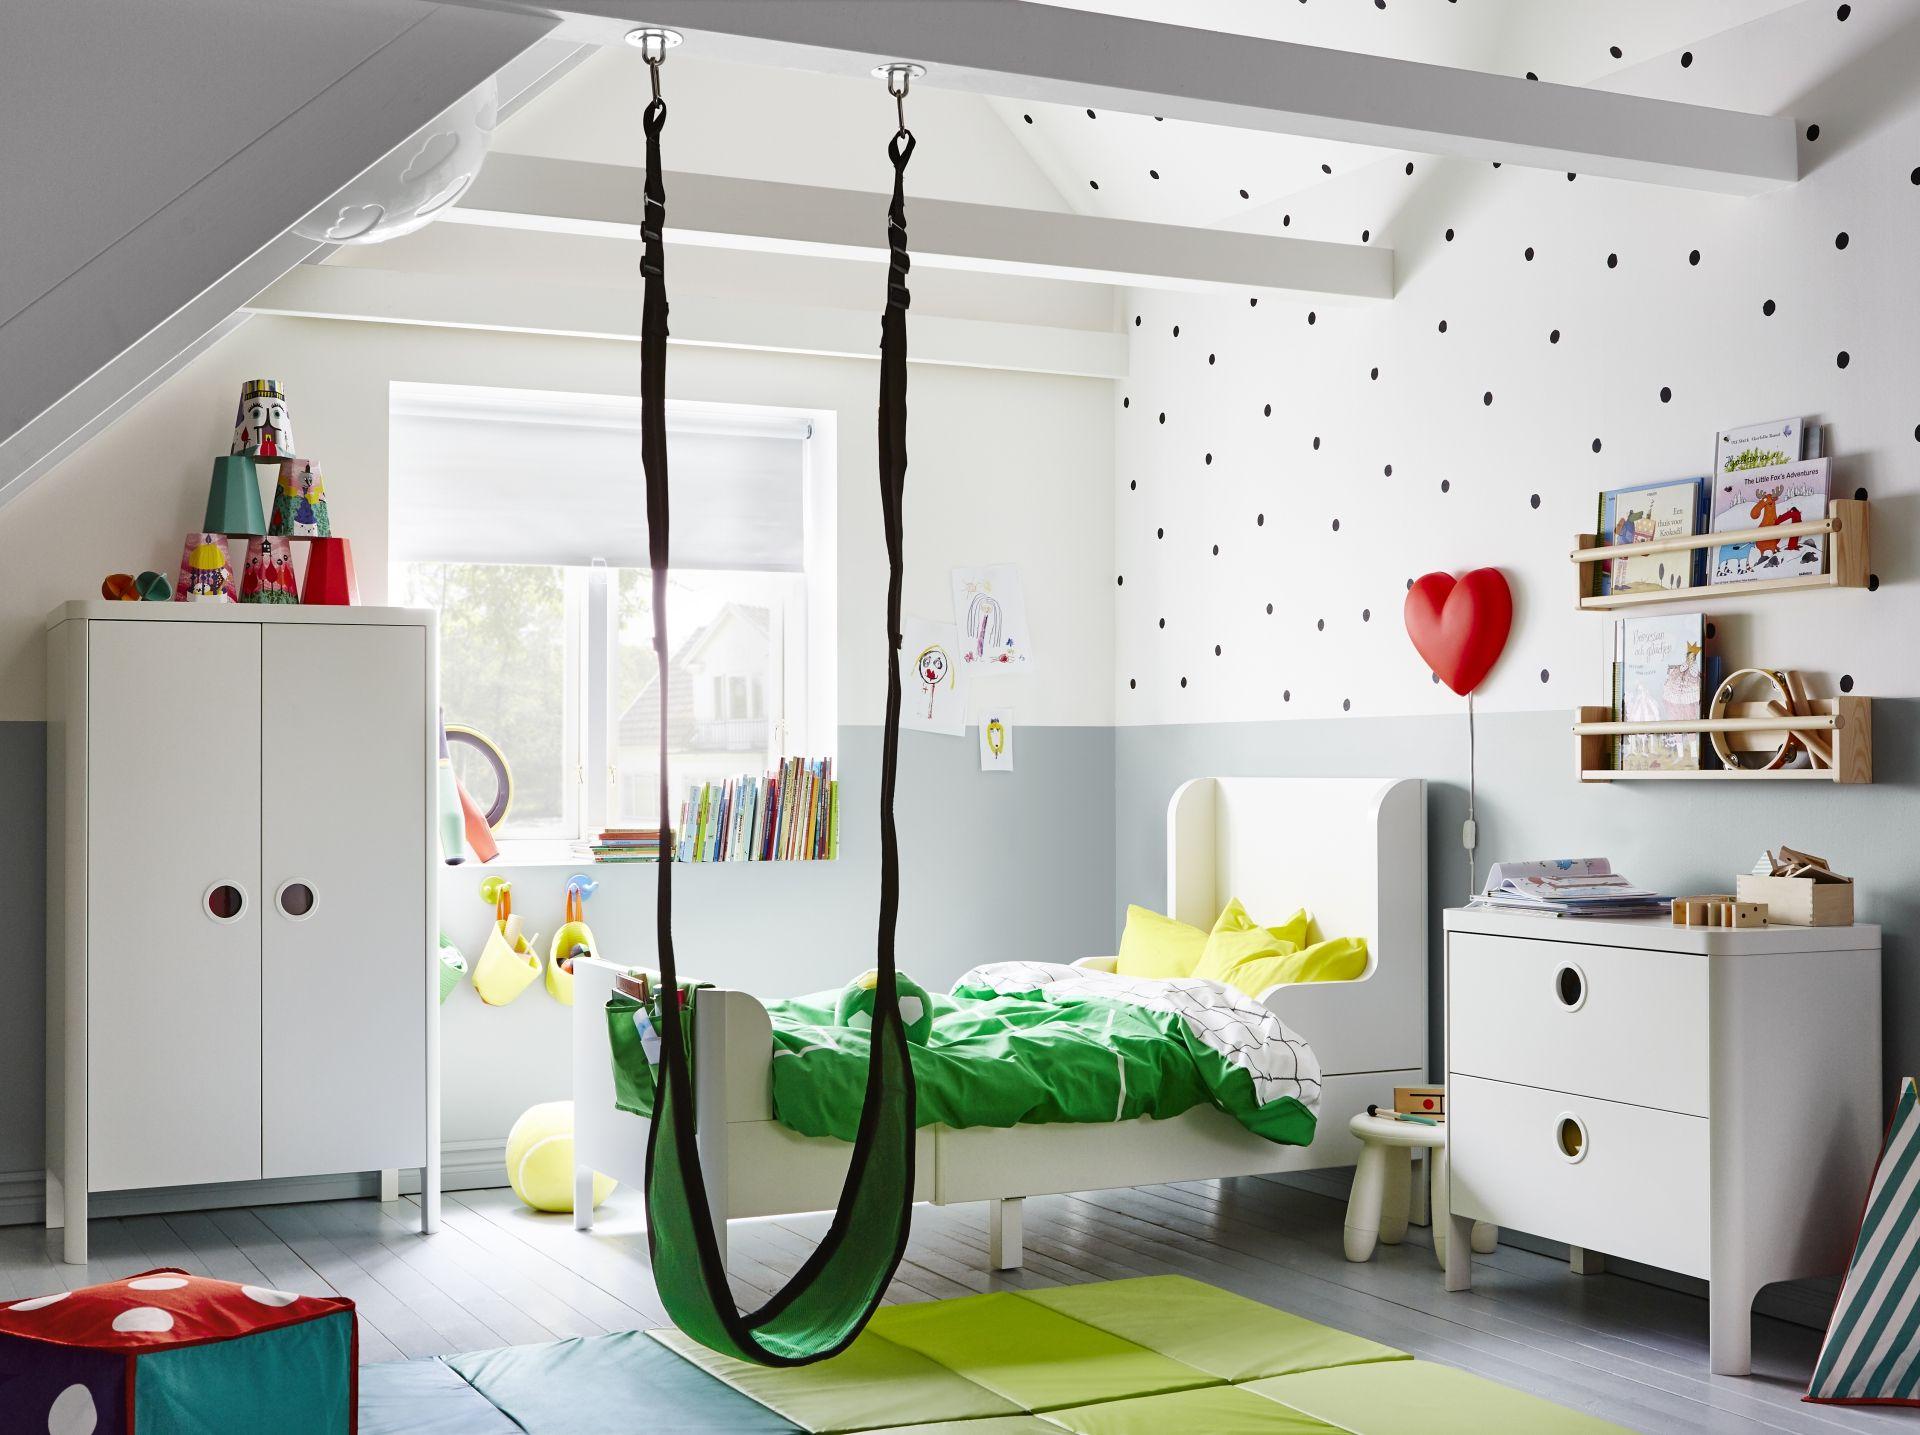 Schommel In Kinderkamer : Gunggung schommel groen kids rooms room and future